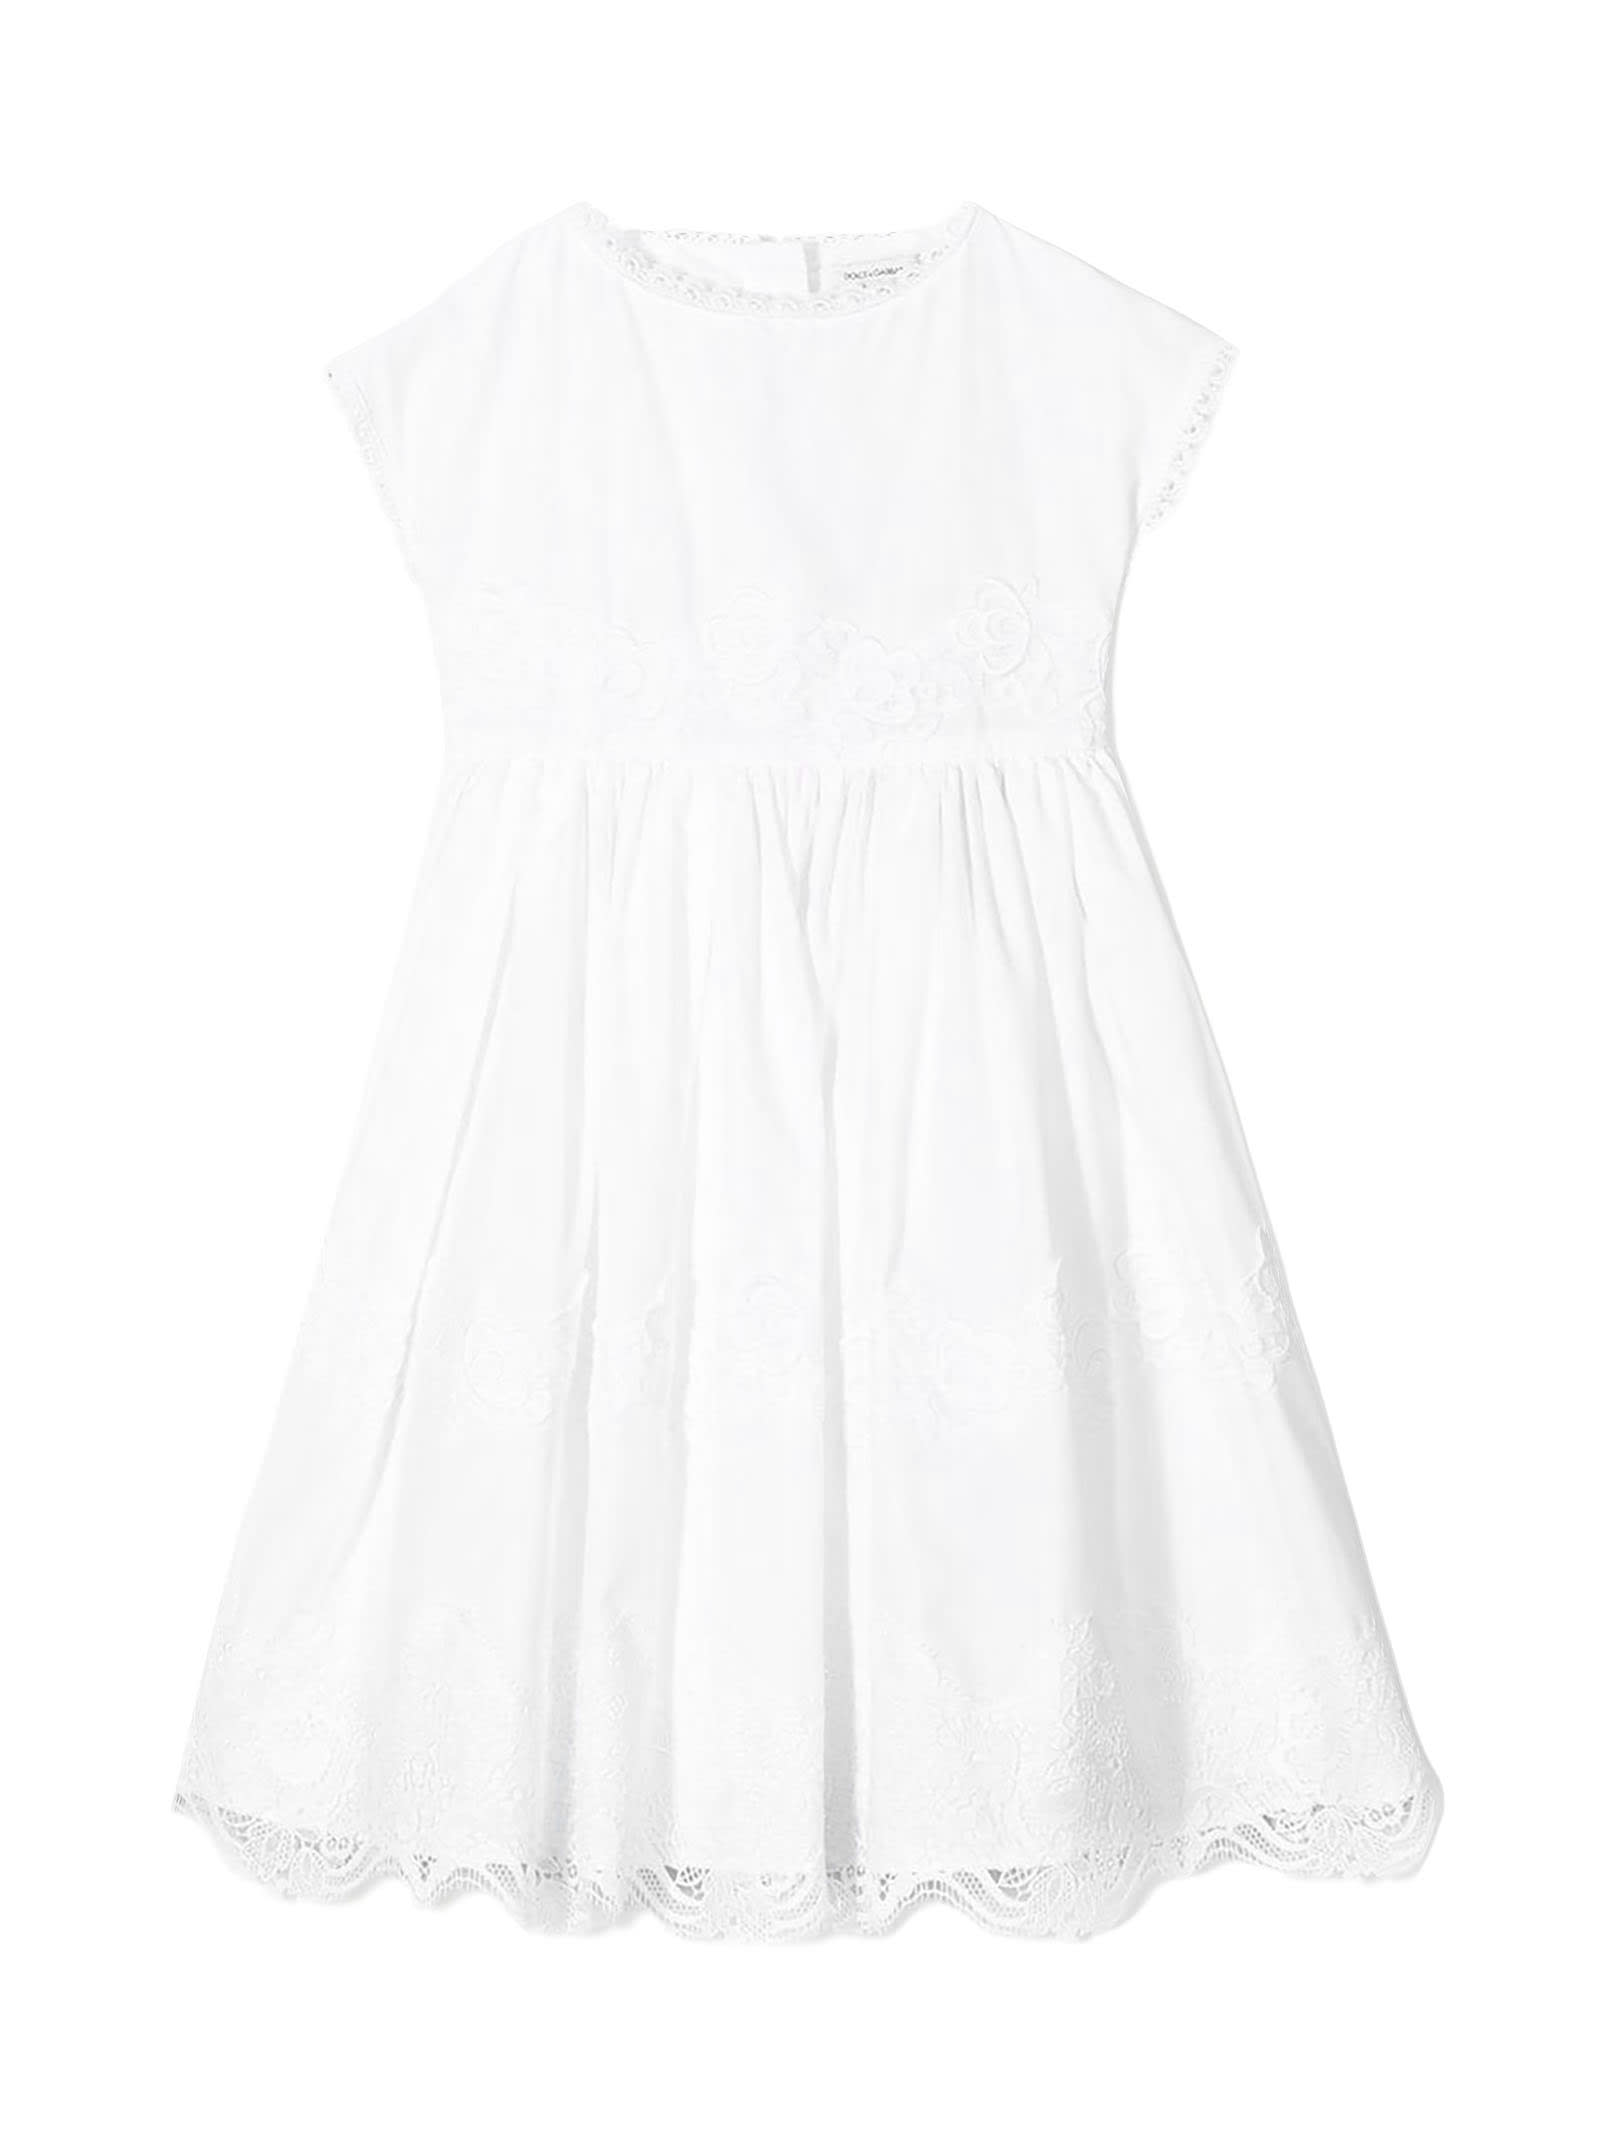 Dolce & Gabbana White Cotton Dress